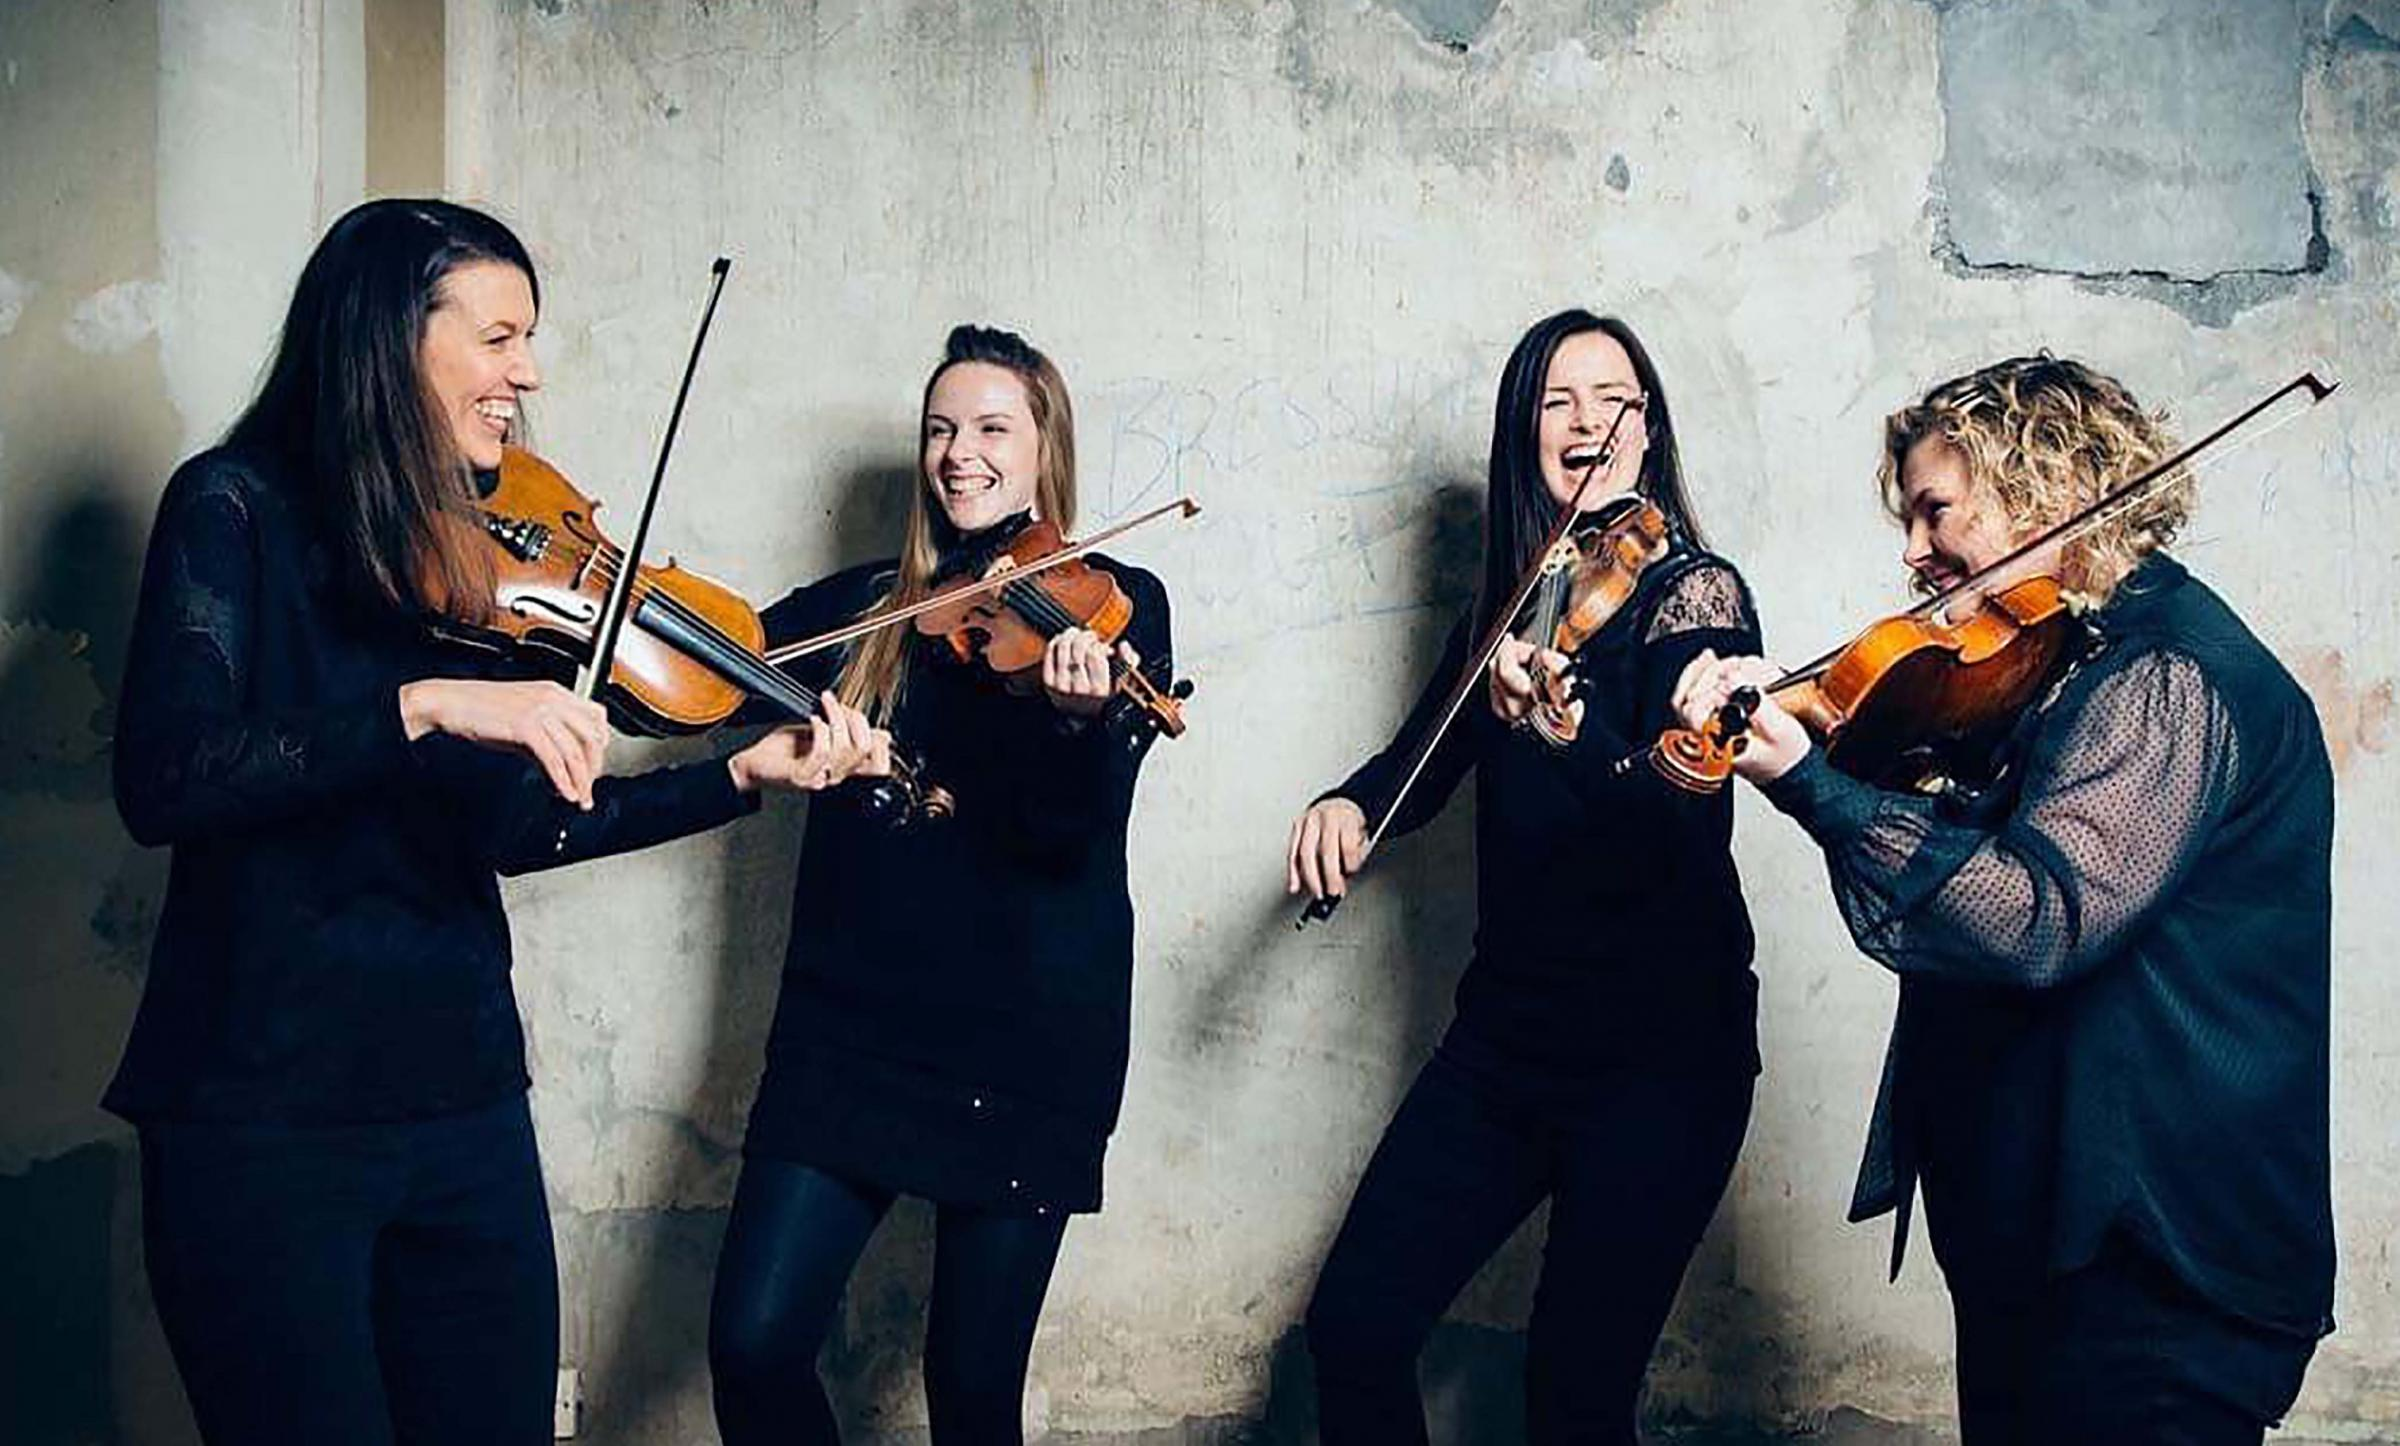 Shetland fiddler Jenna Reid on the inspiration that drove her latest